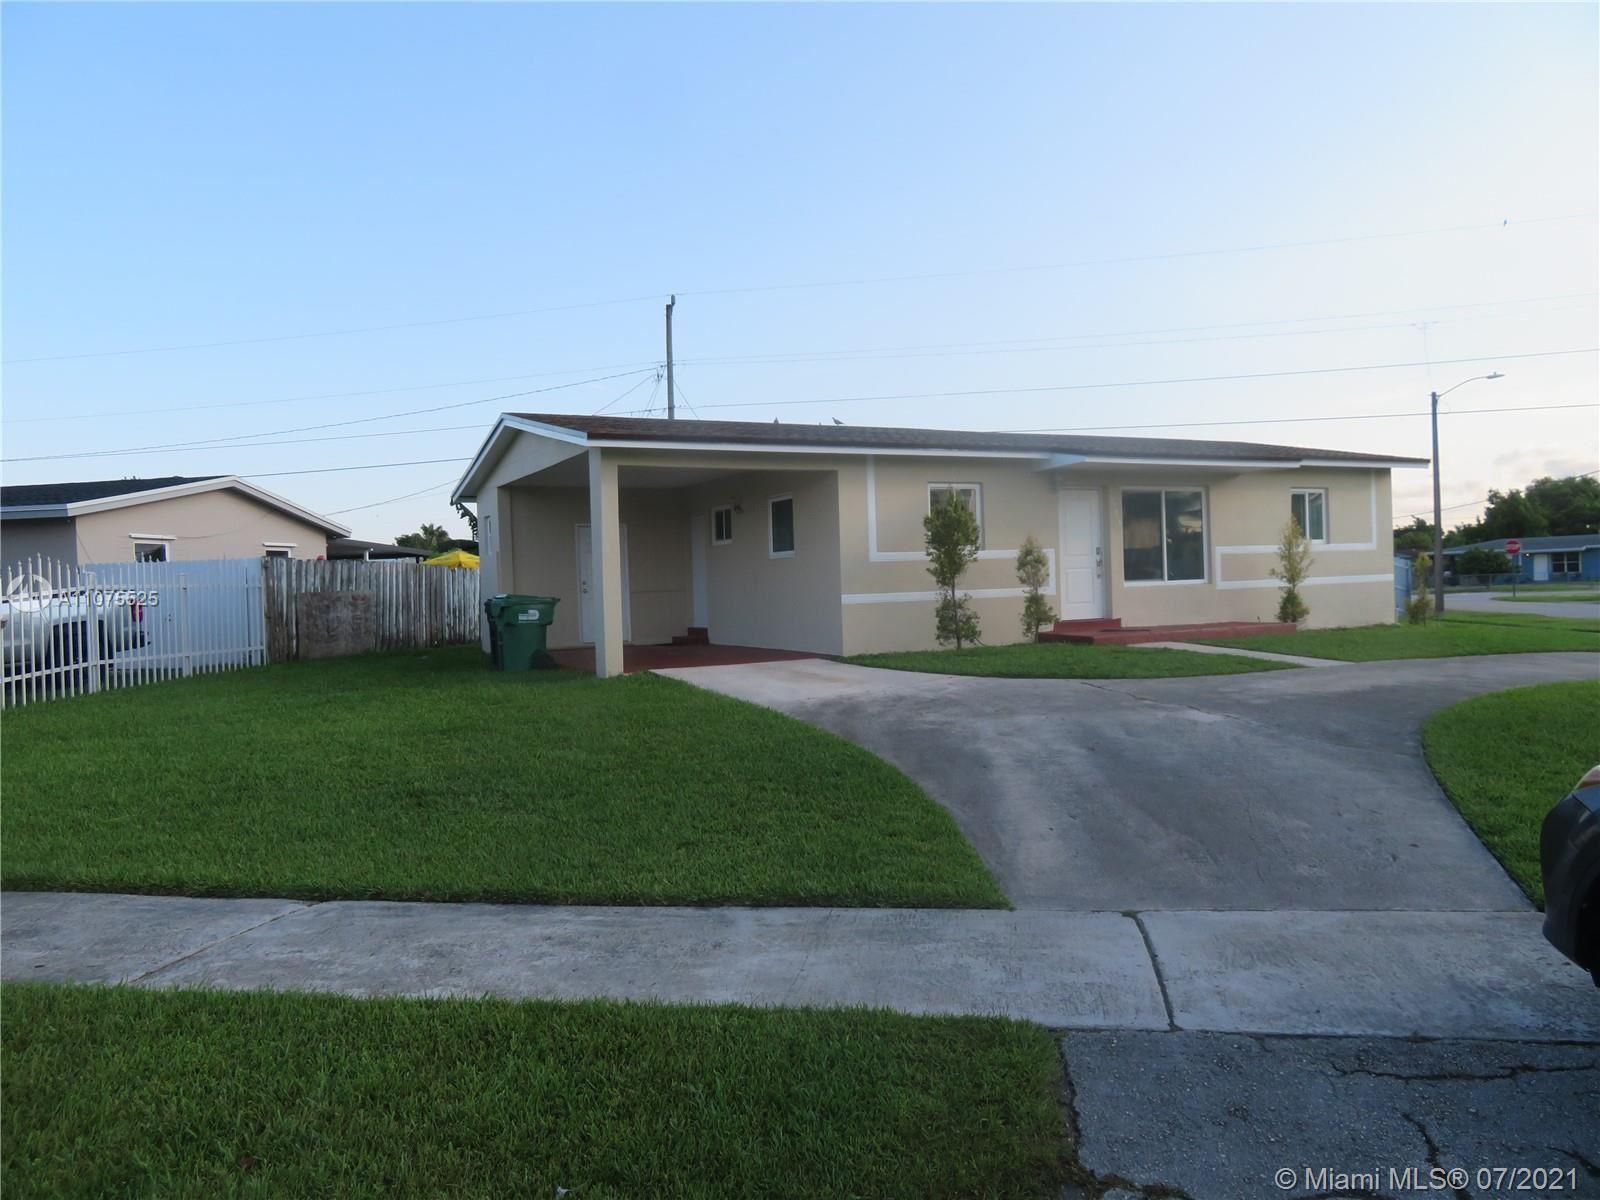 Photo of 11805 SW 186th St, Miami, FL 33177 (MLS # A11075525)